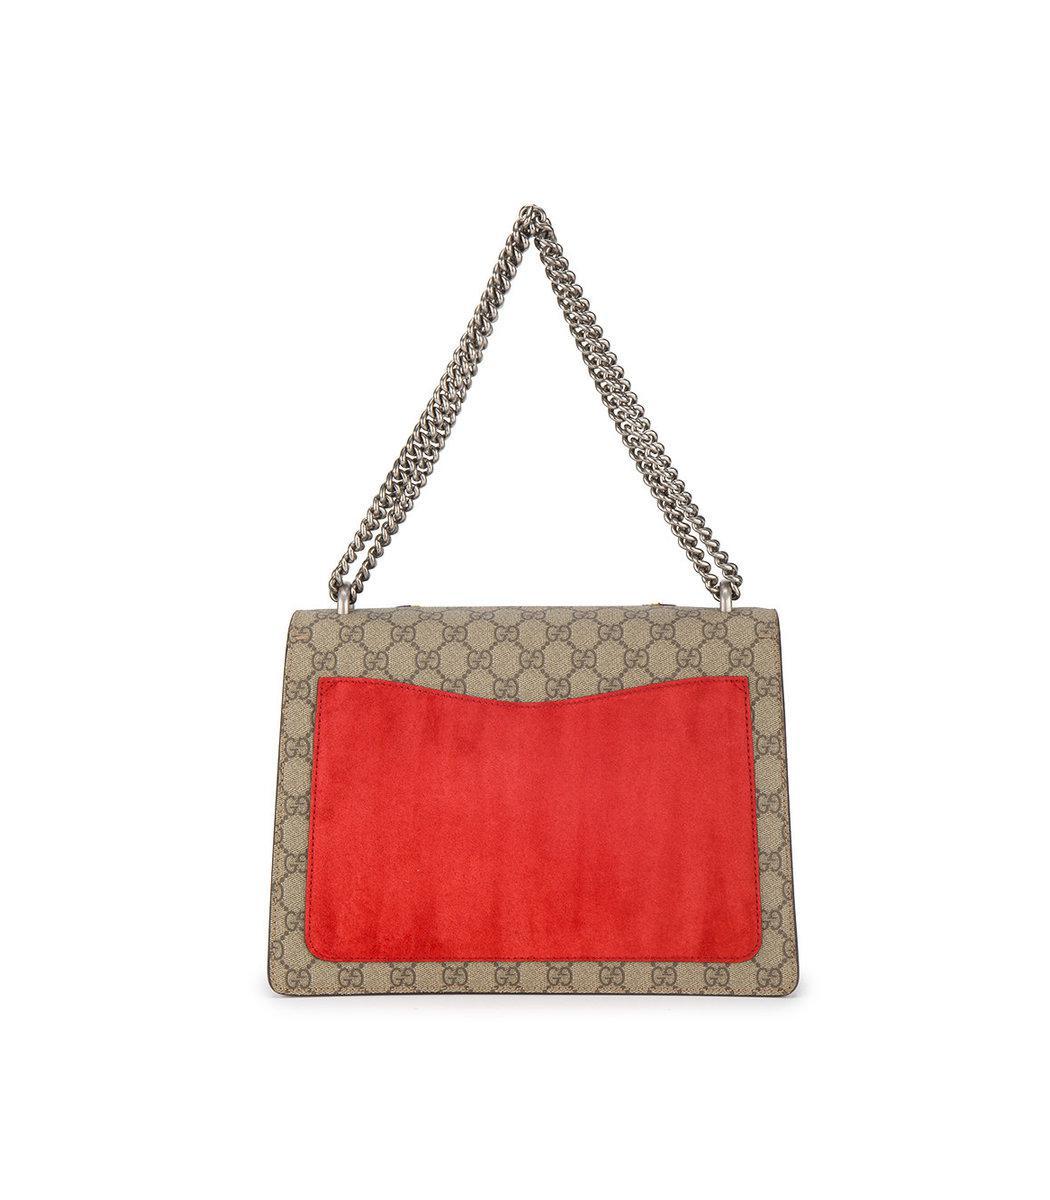 98f3f0cbe Gucci Multicolor Moth Embroidered Dionysus Shoulder Bag - Lyst